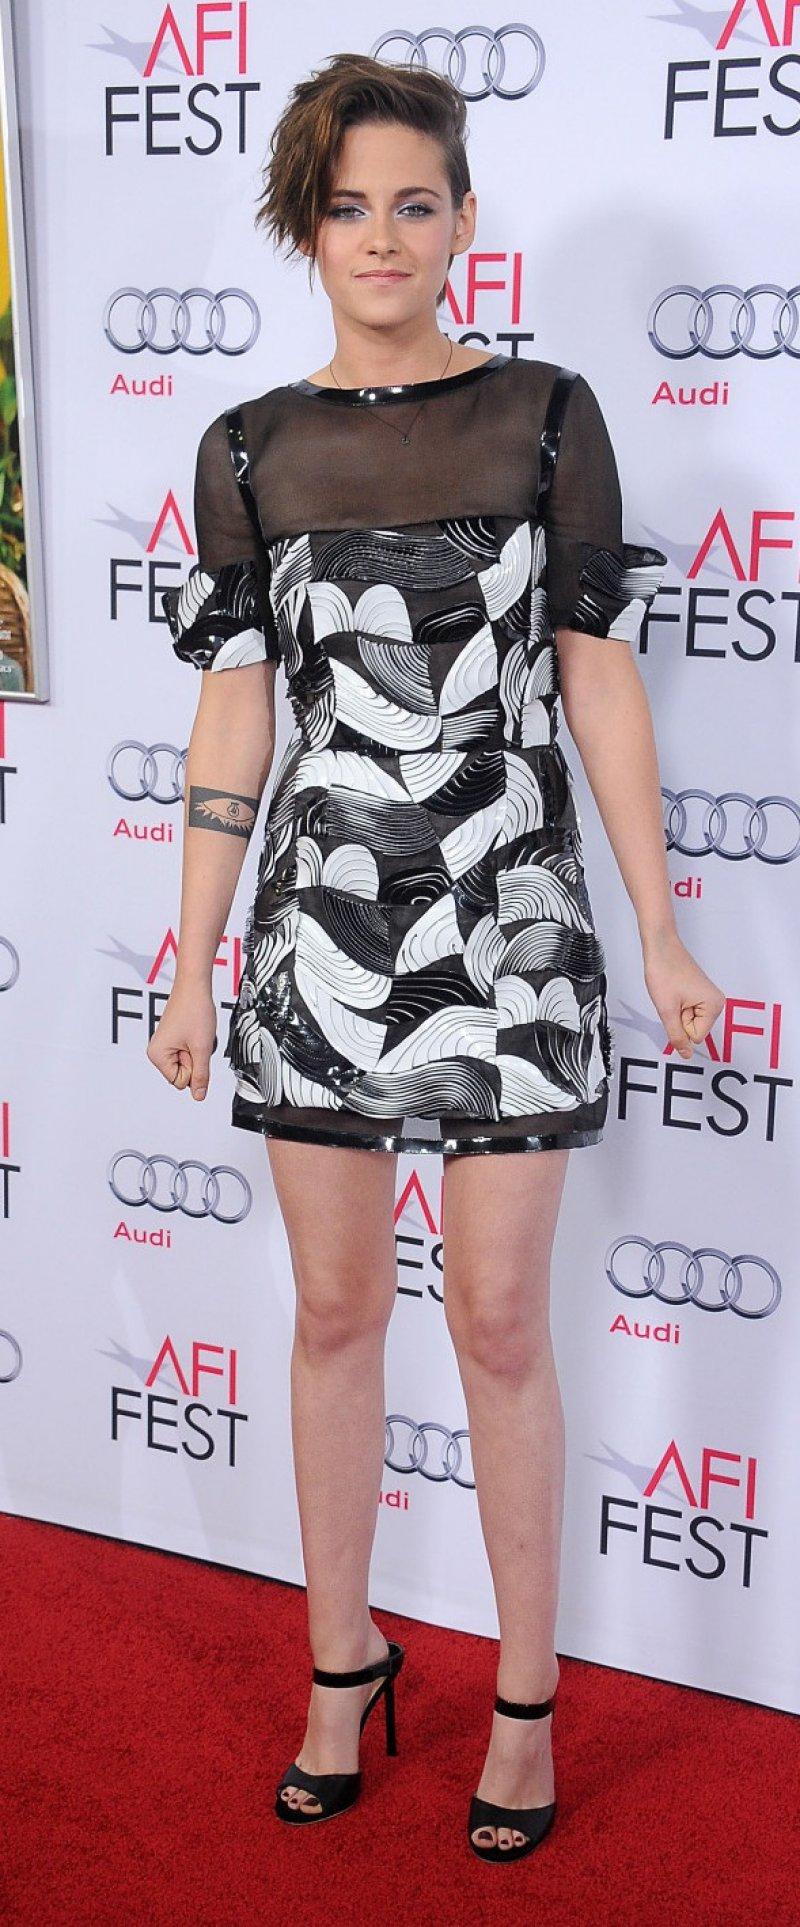 Kristen Stewart S Legs And Feet 23 Sexiest Celebrity Legs